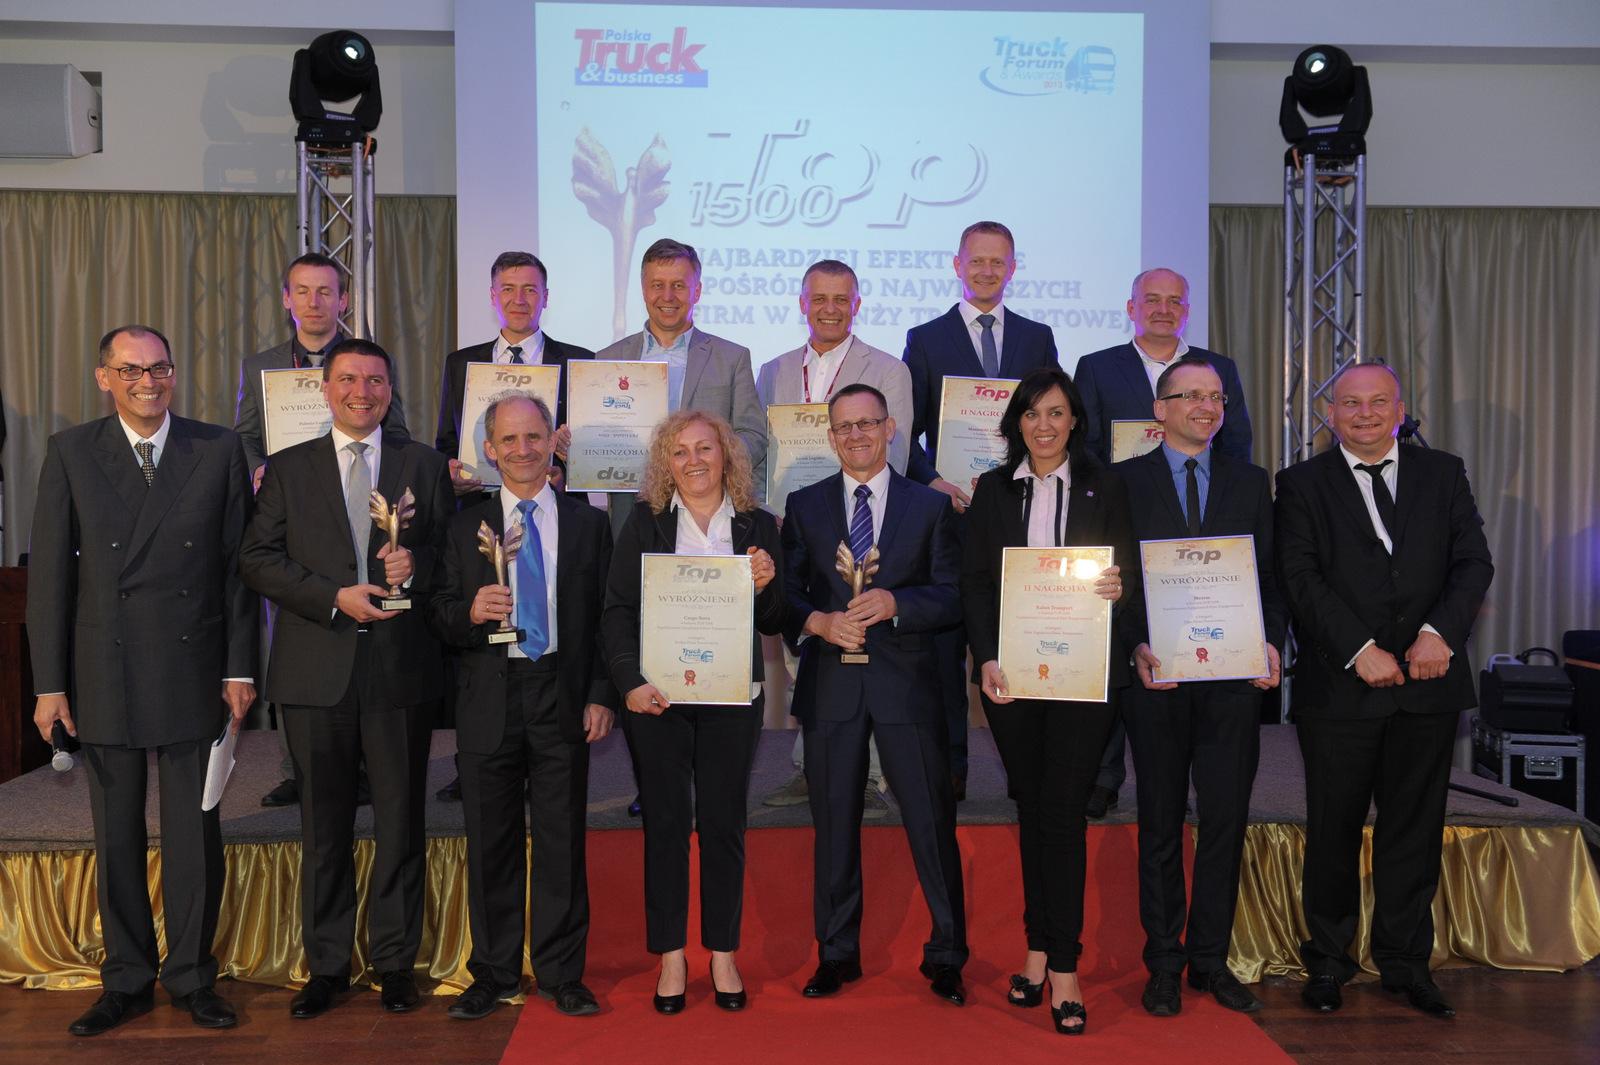 Truck Forum & Awards 2013: Energia dla transportu